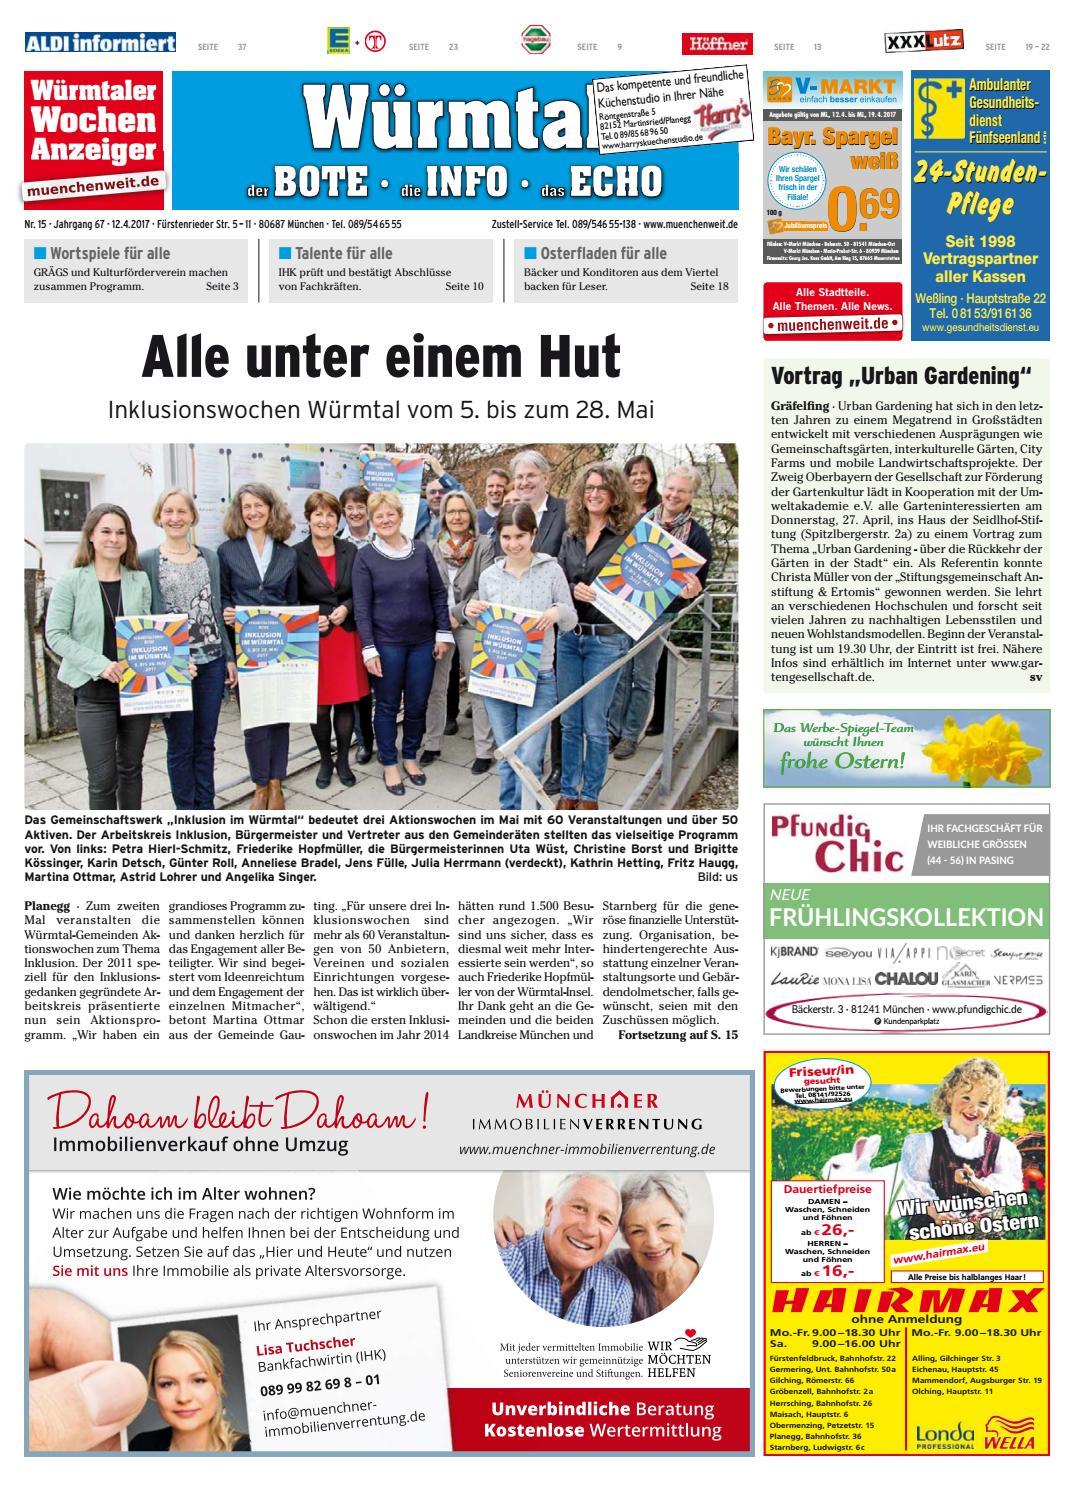 domina ingolstadt mutzenbacher porn